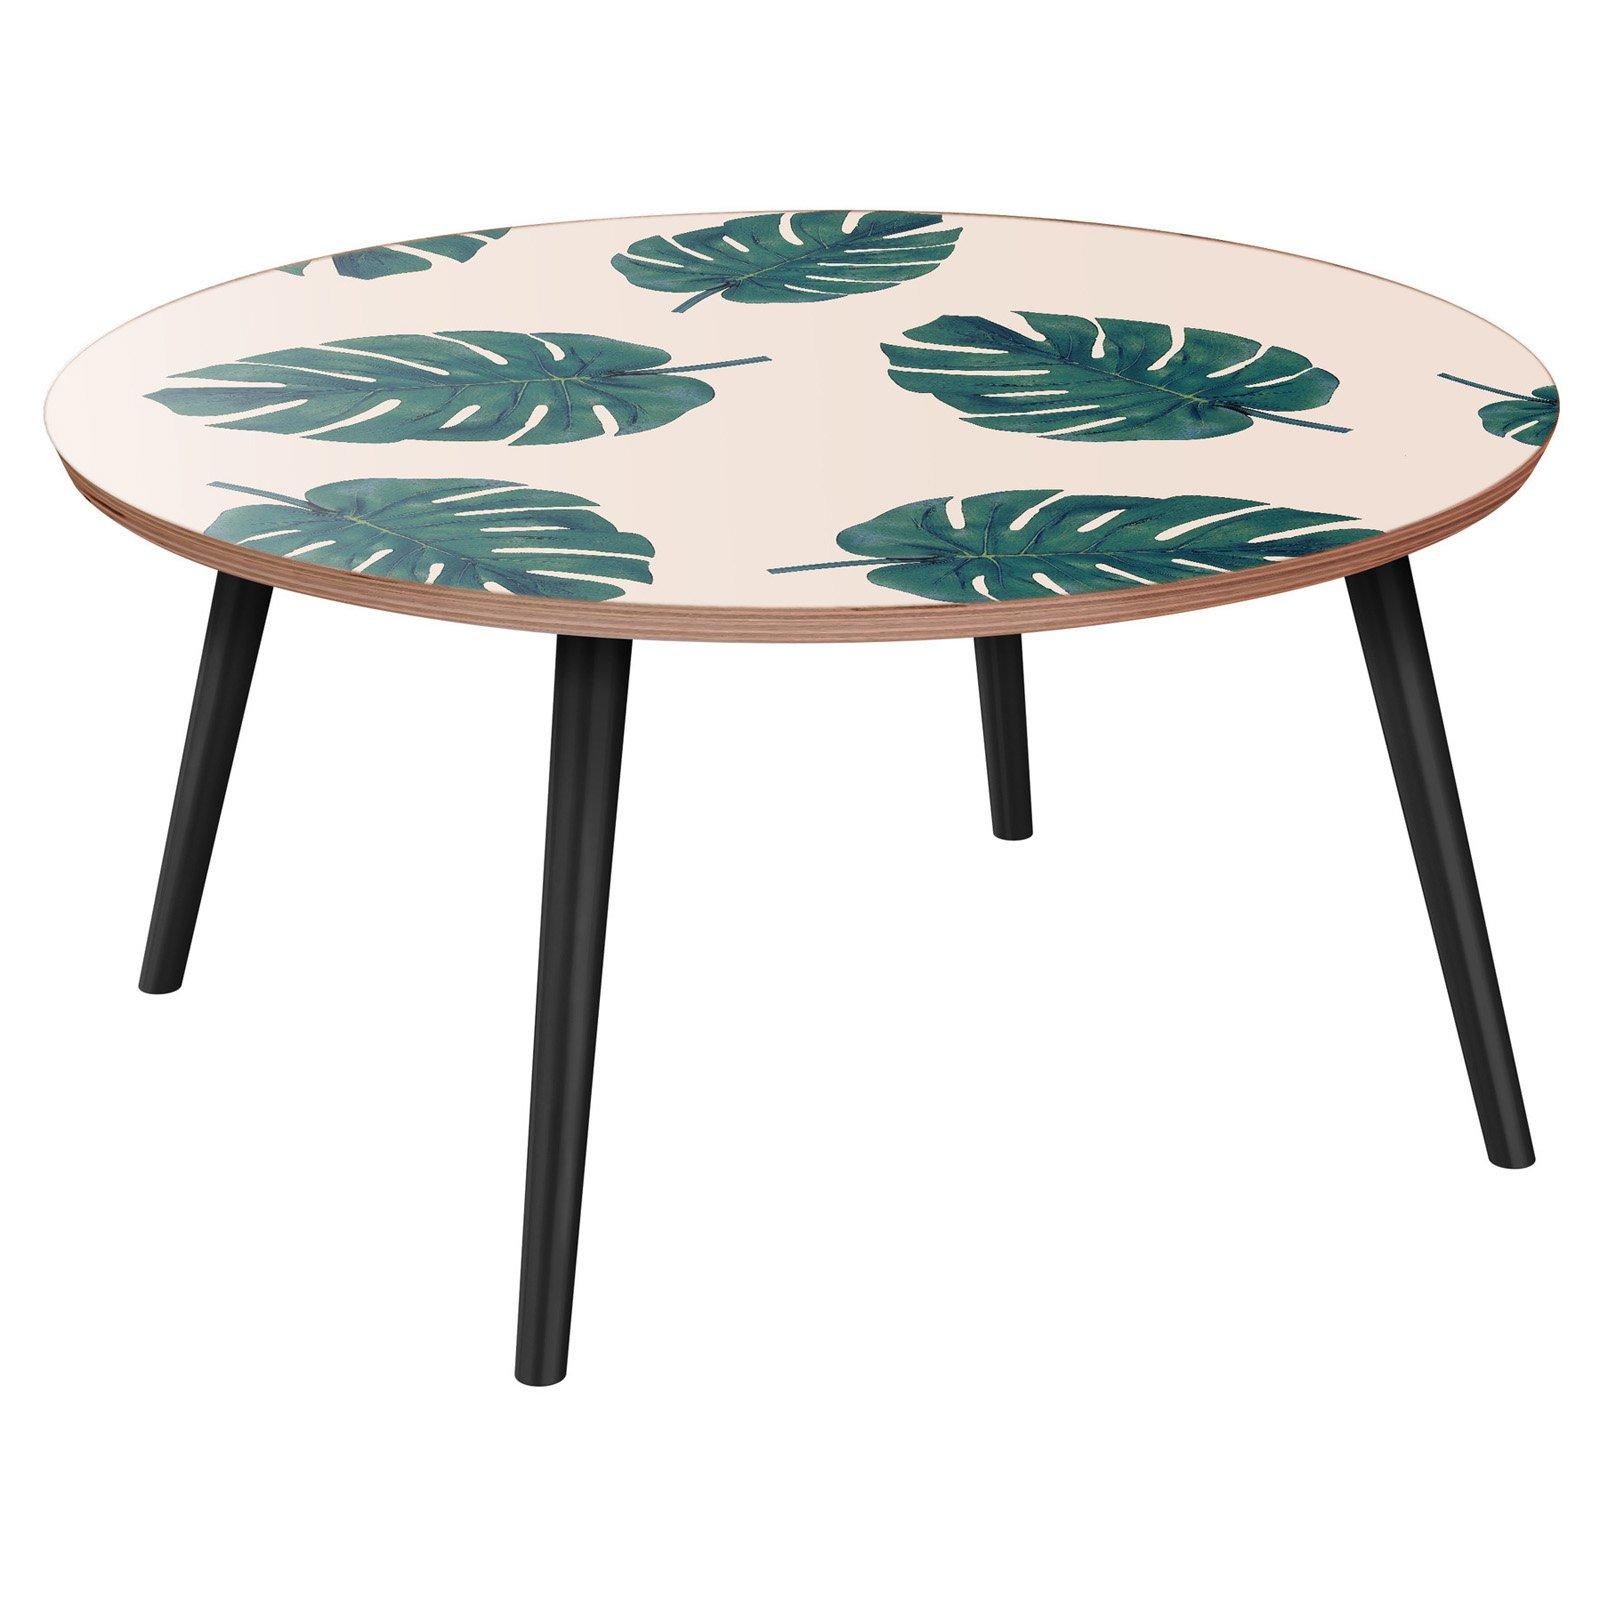 Nyekoncept Stella Modern Tropics Flare Coffee Table Coffee Table Contemporary Coffee Table Coffee Table Wood